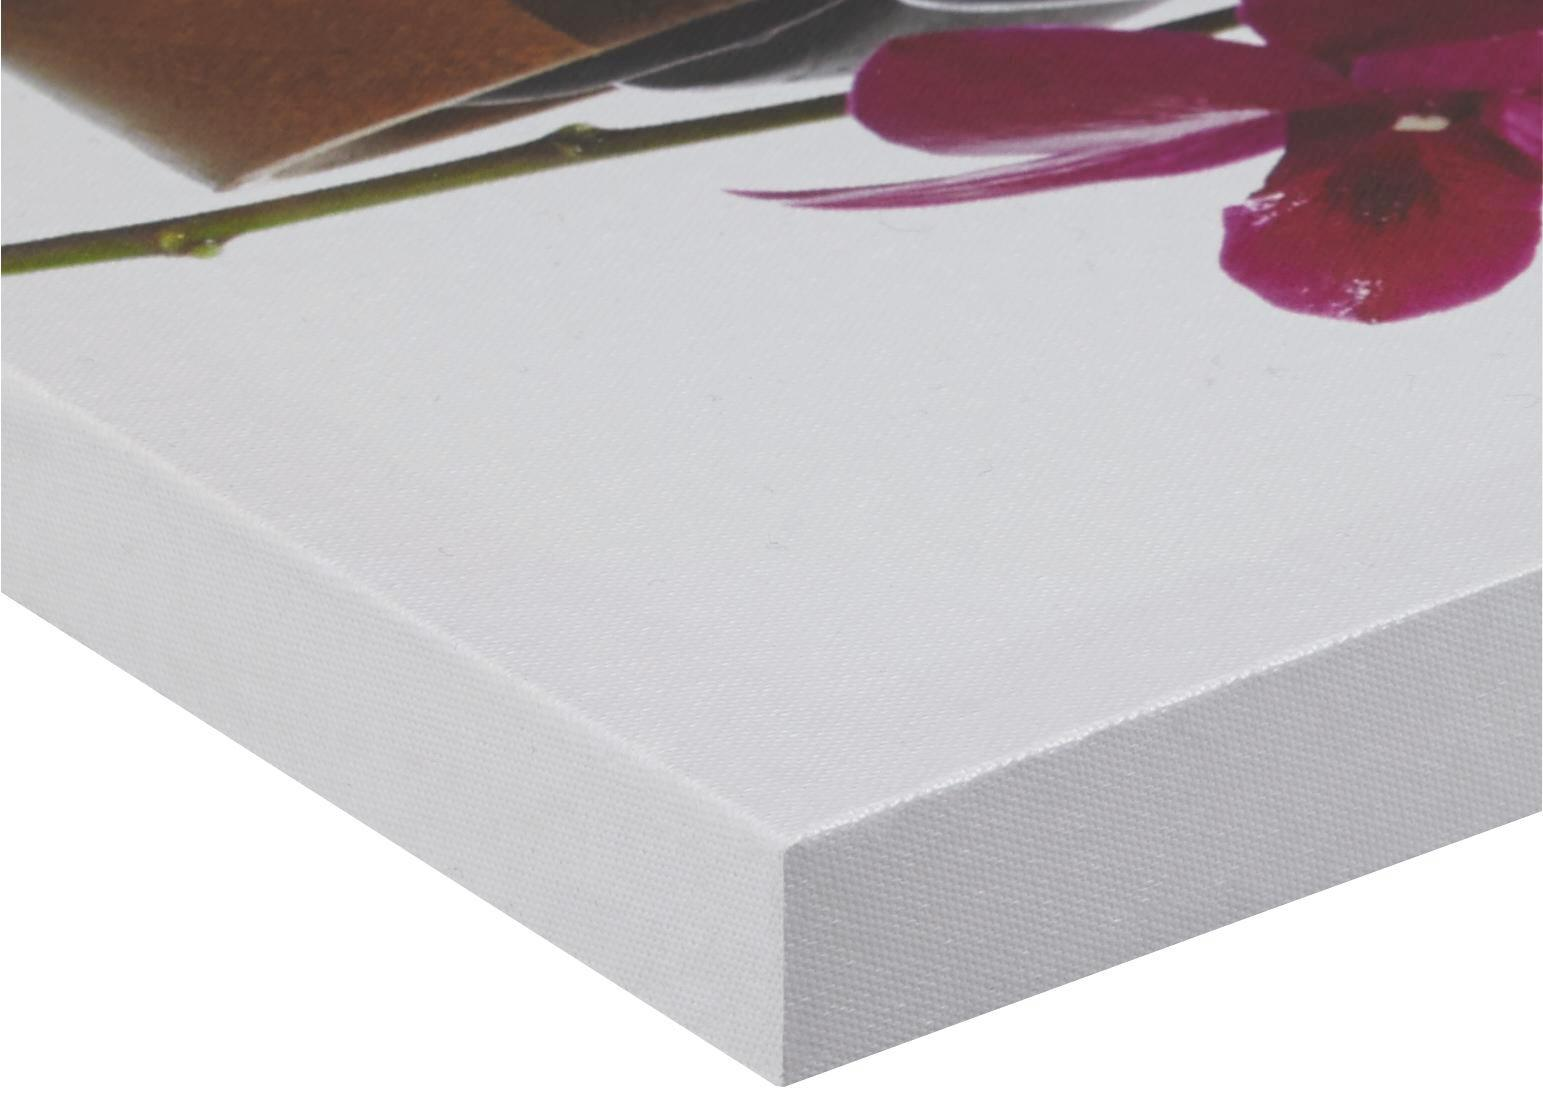 Bild Orchidee, ca. 30x90x2,5cm - Multicolor, LIFESTYLE, Holz/Textil (30/90/2,5cm) - MÖMAX modern living